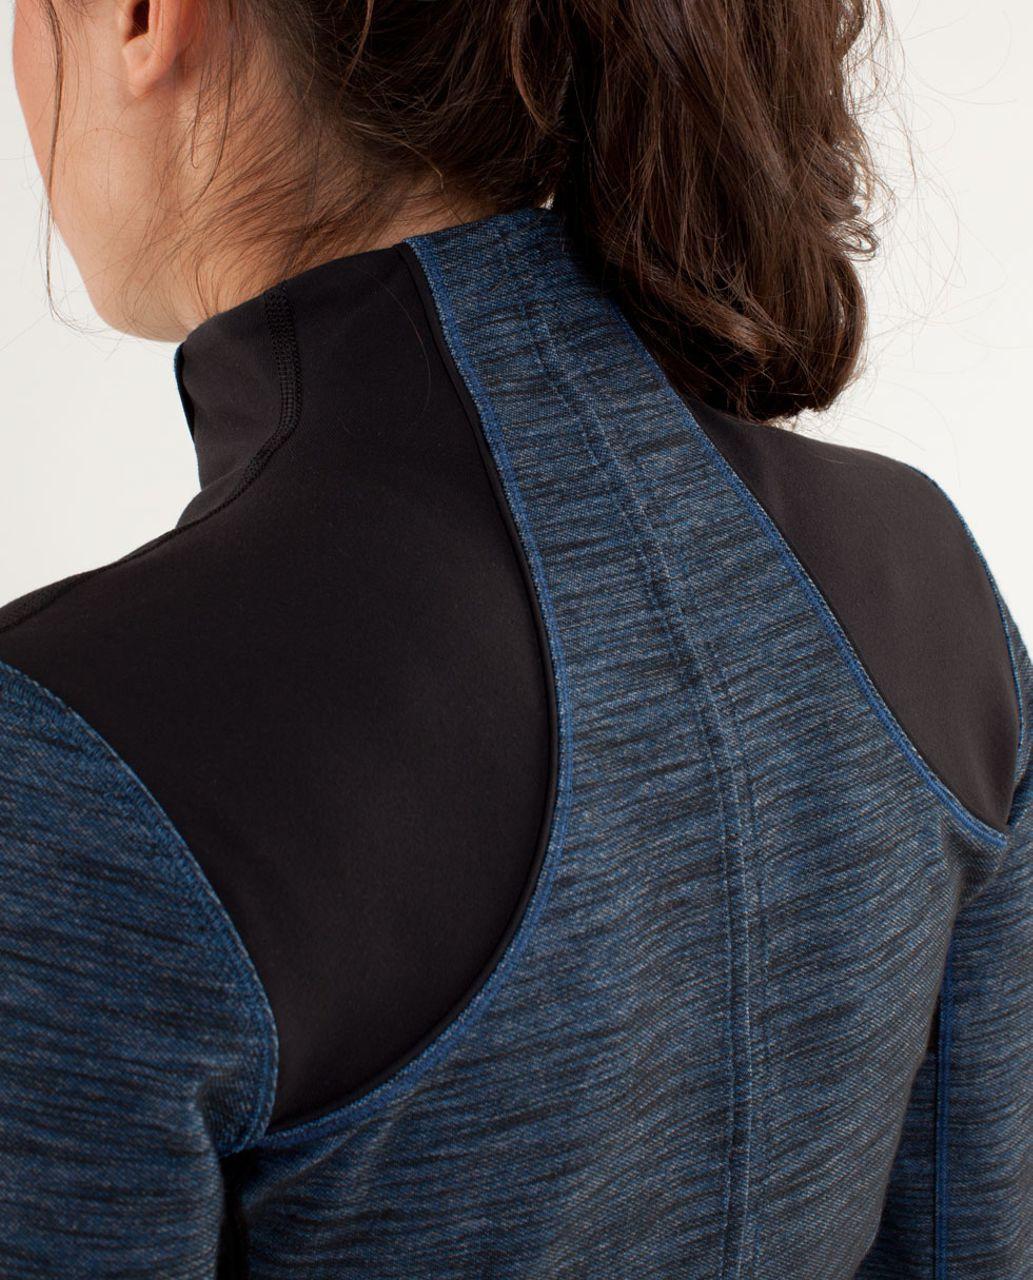 Lululemon Forme Jacket - Reversible Slub Denim Limitless Blue / Black